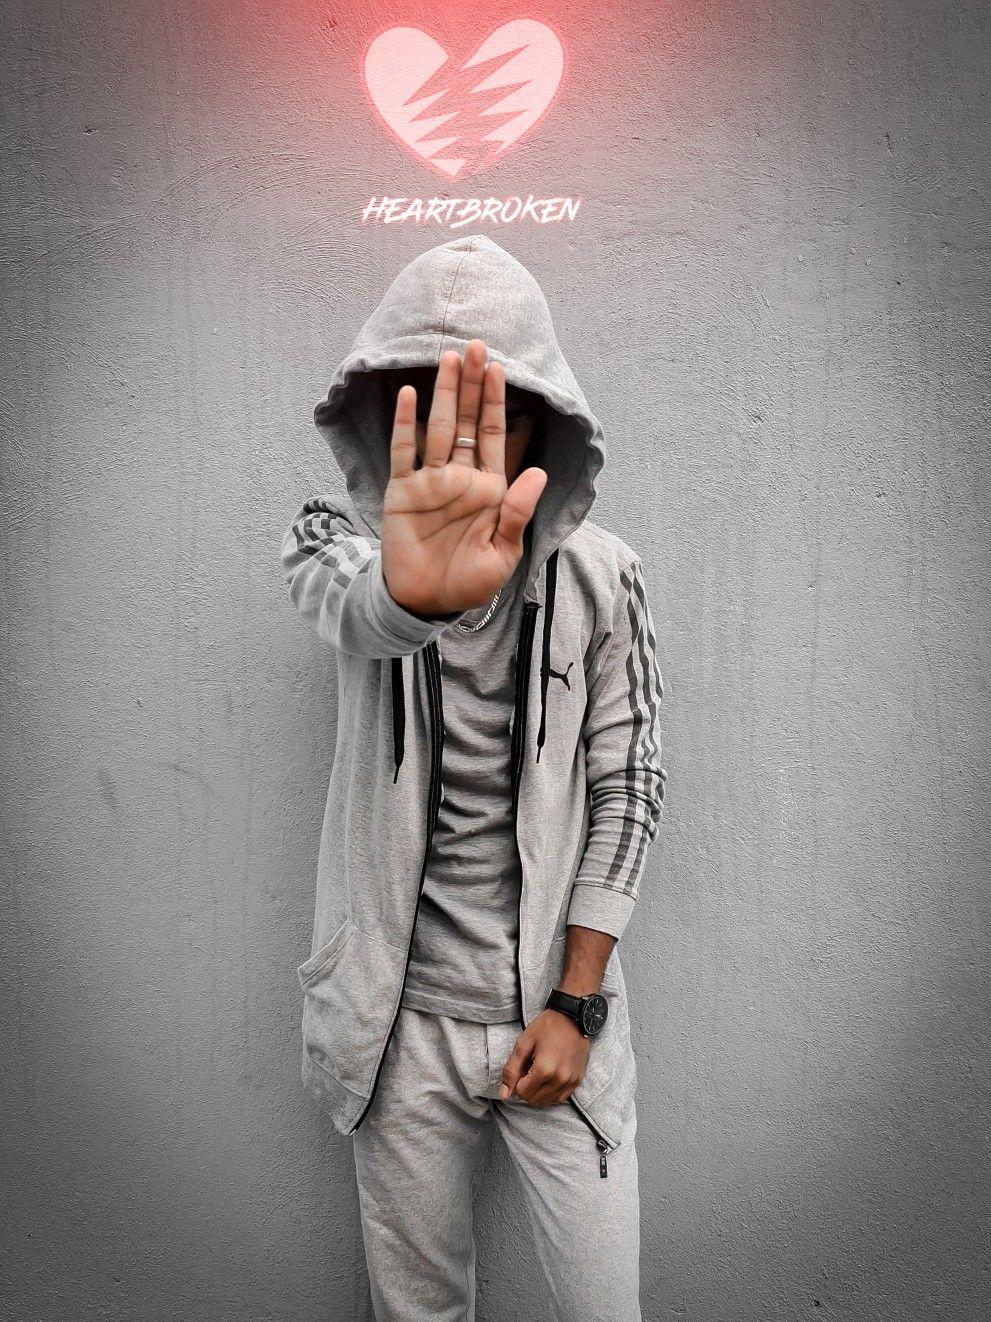 Heart Broken Boy Dp Cute Romantic Quotes Attitude Quotes For Boys Joker Videos Full hd broken heart alone boy